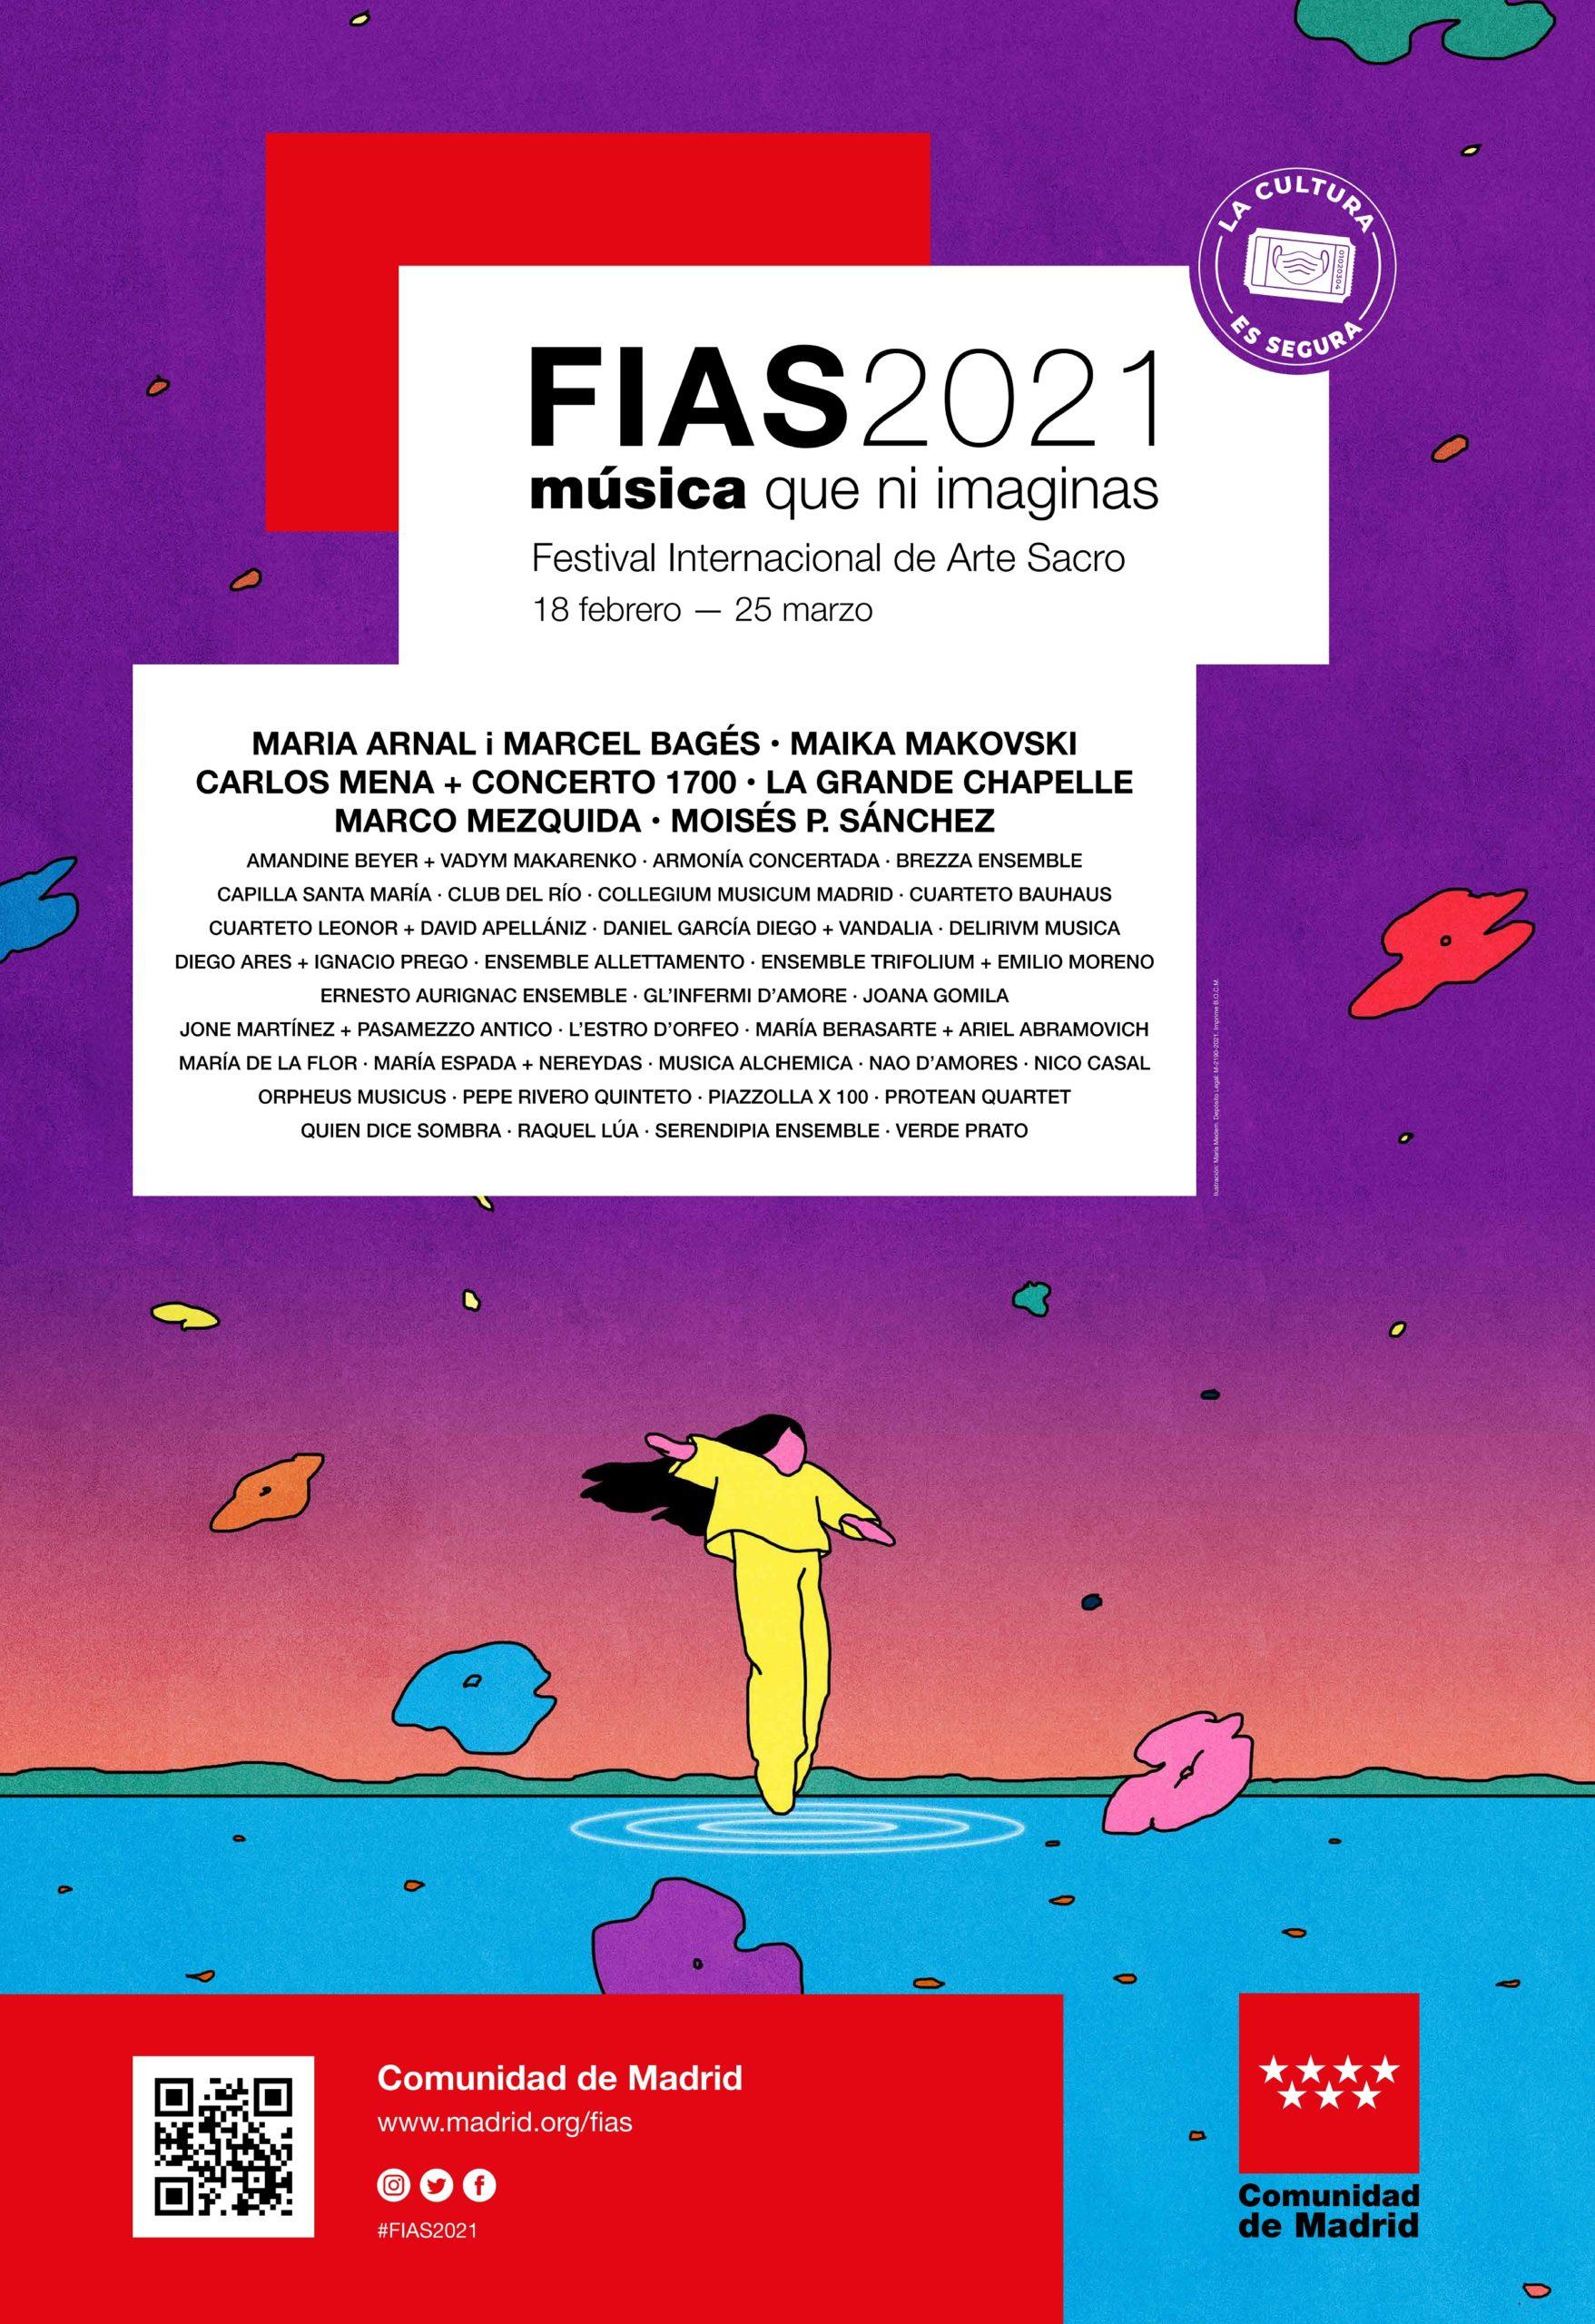 CARTEL_FIAS2021-25@madrid.org